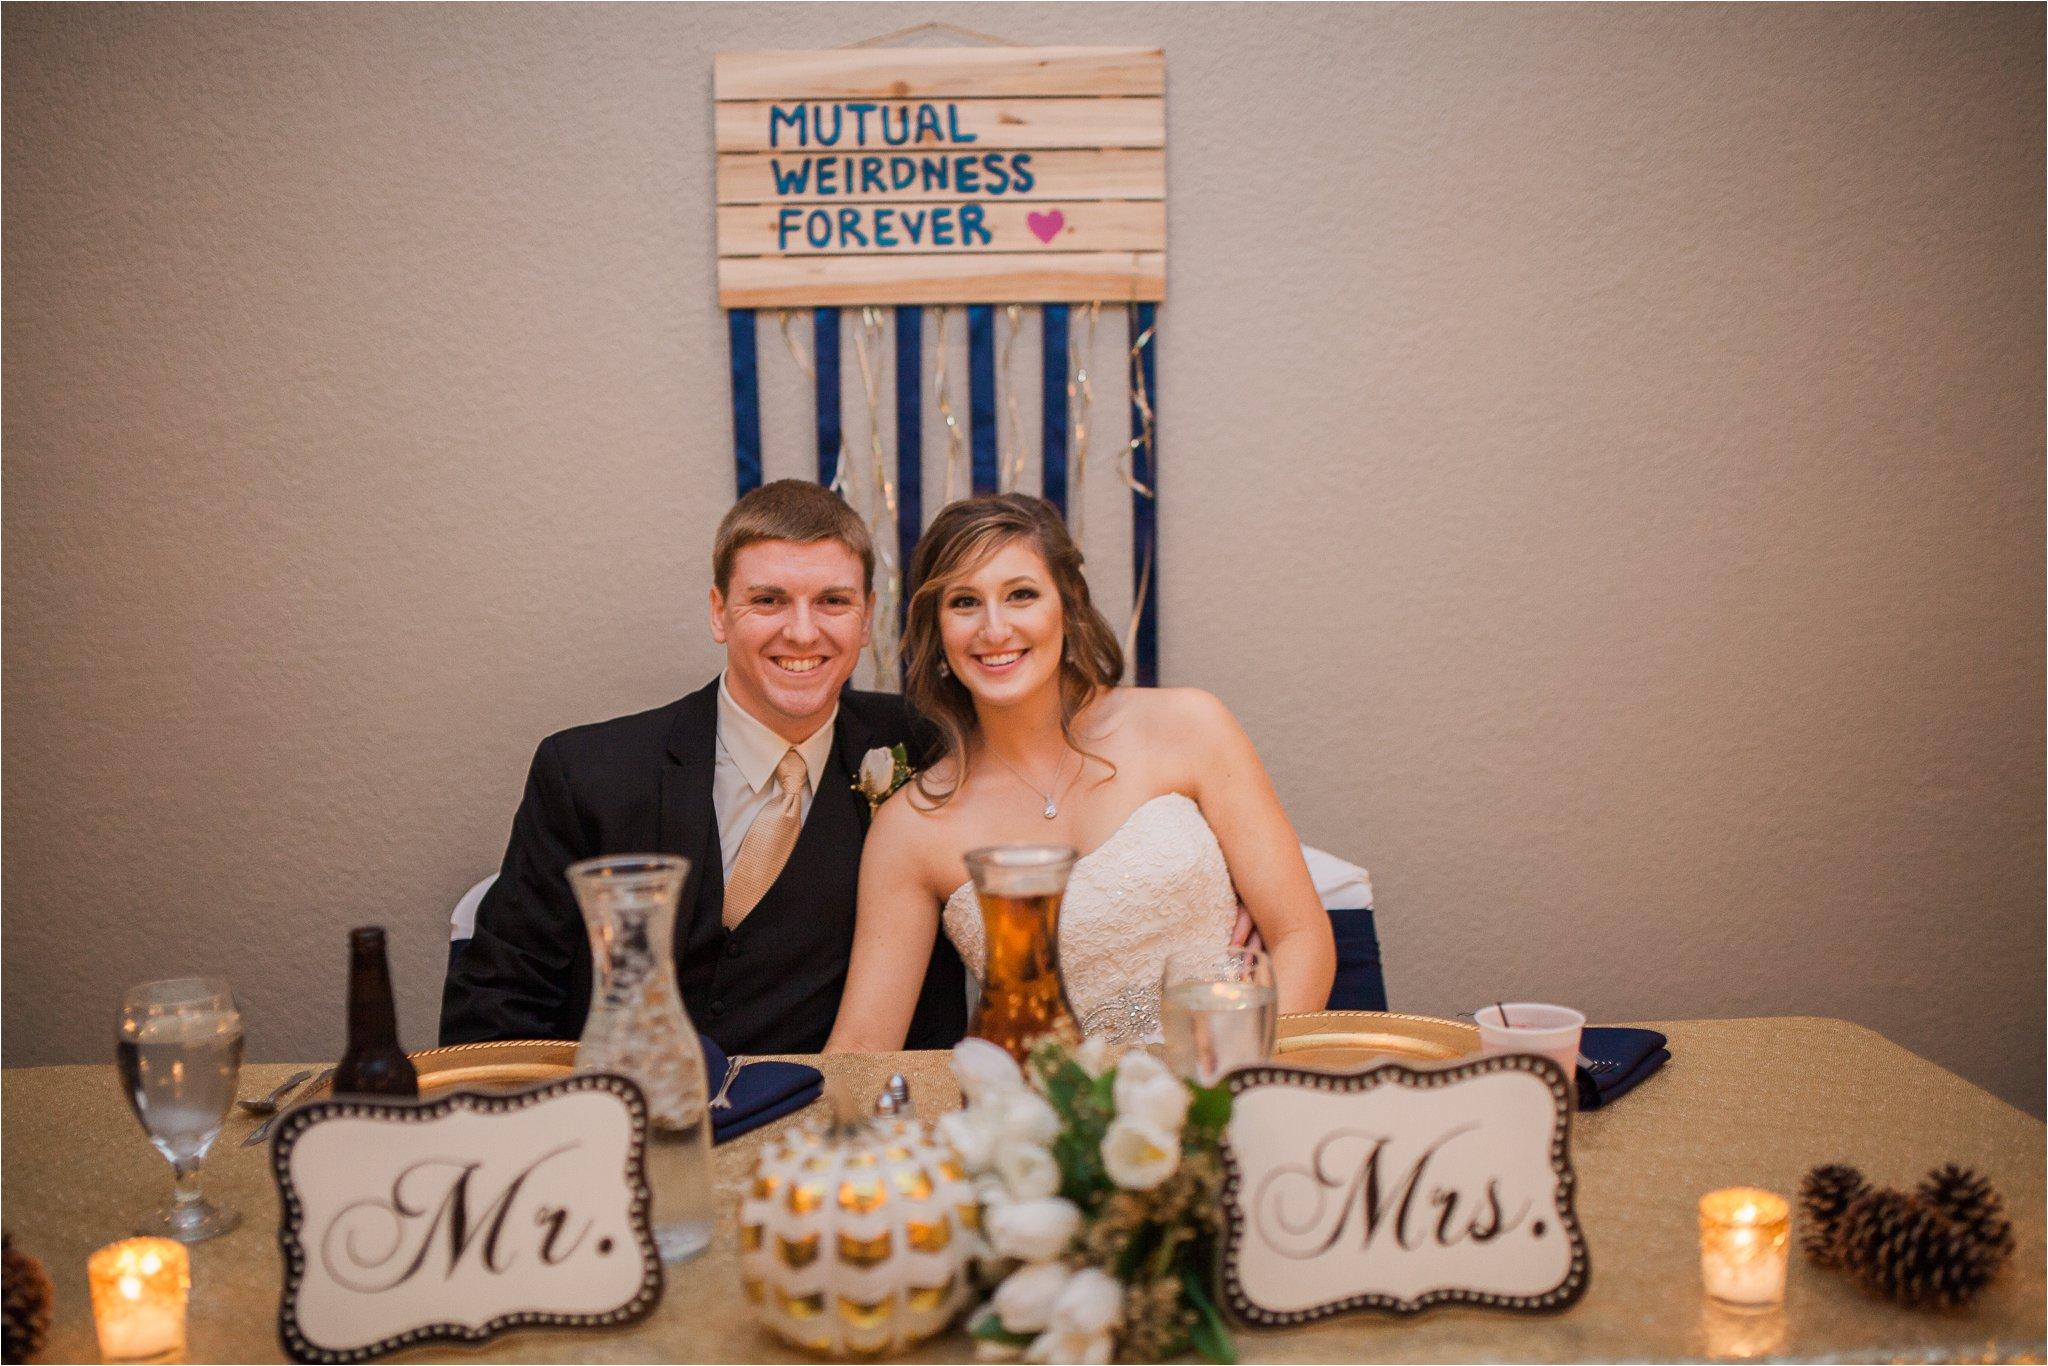 lunsford-wedding-822.jpg